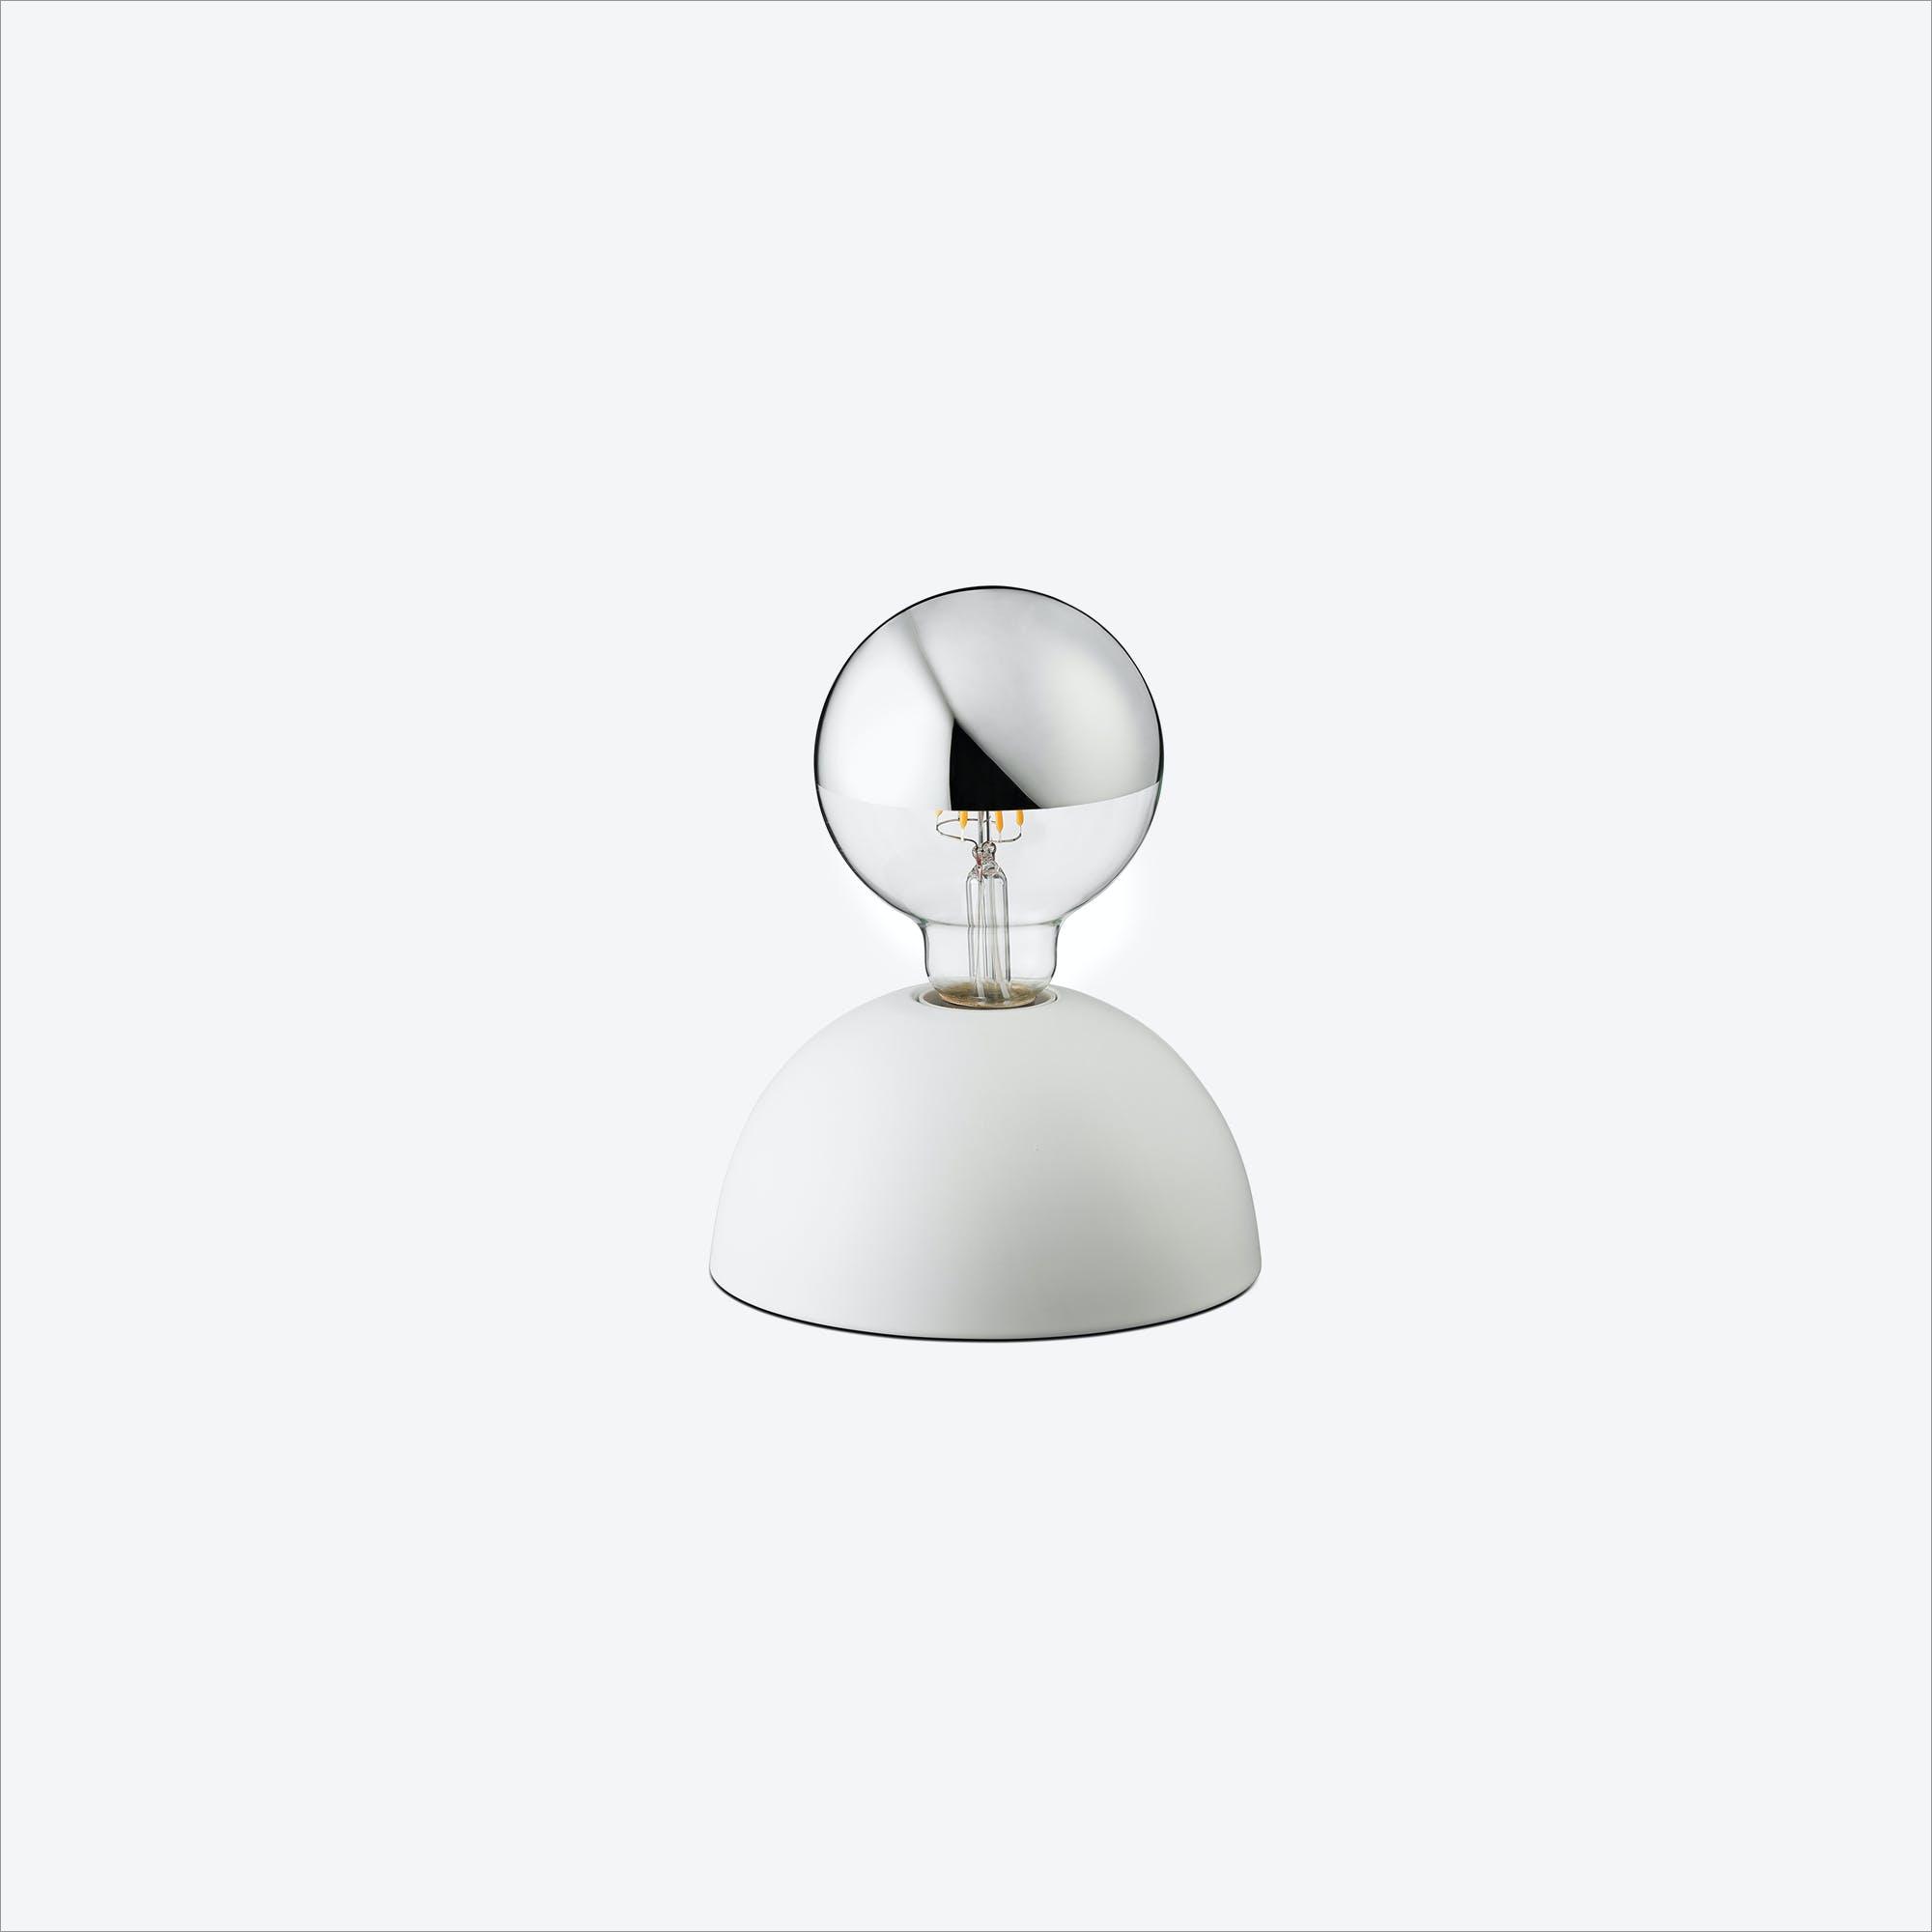 Pat Table Lamp in White